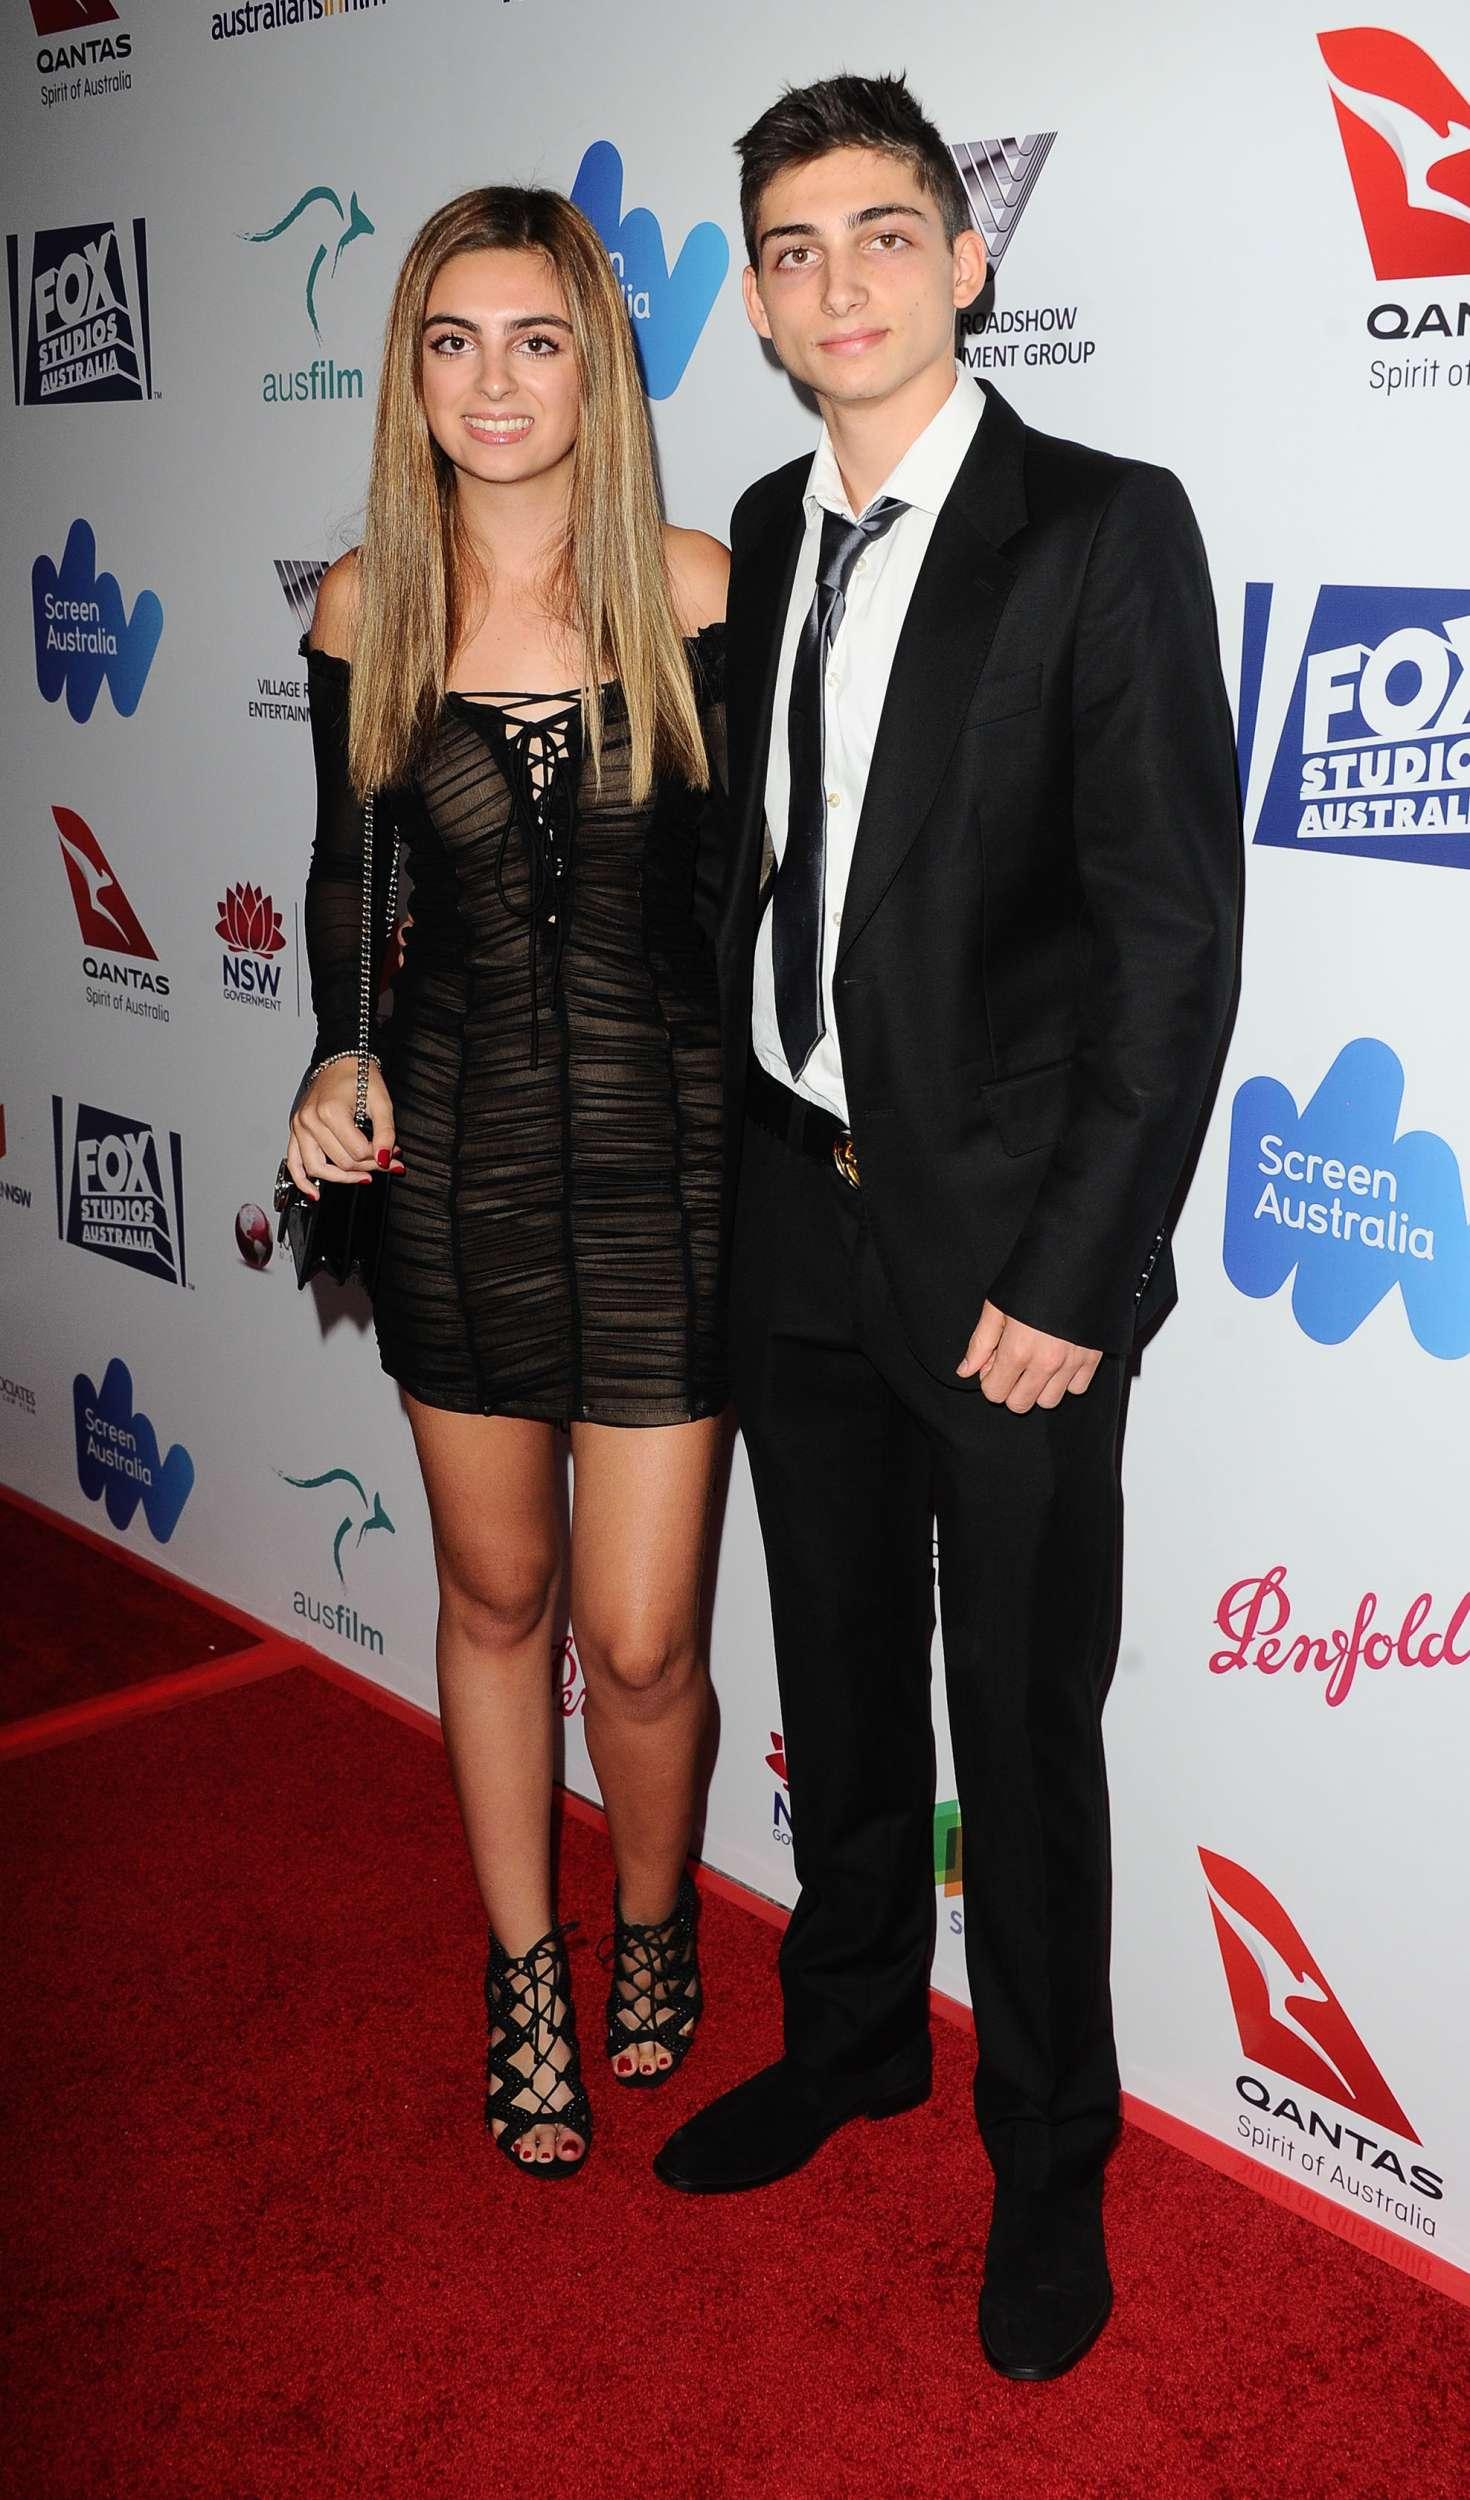 Dani zvulun australians in film awards benefit dinner in los angeles